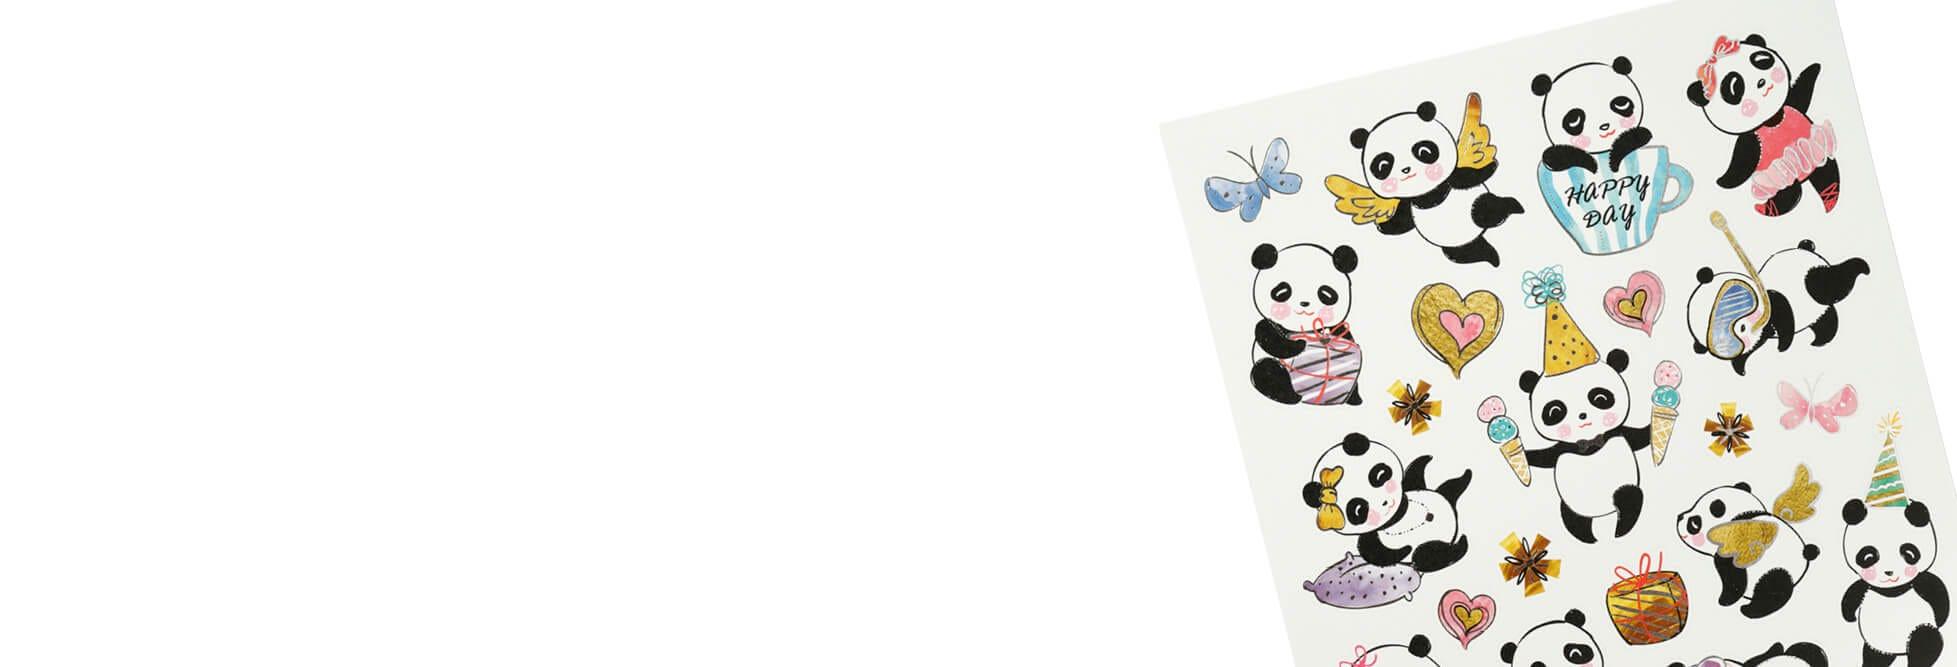 Stickers og glansbilder